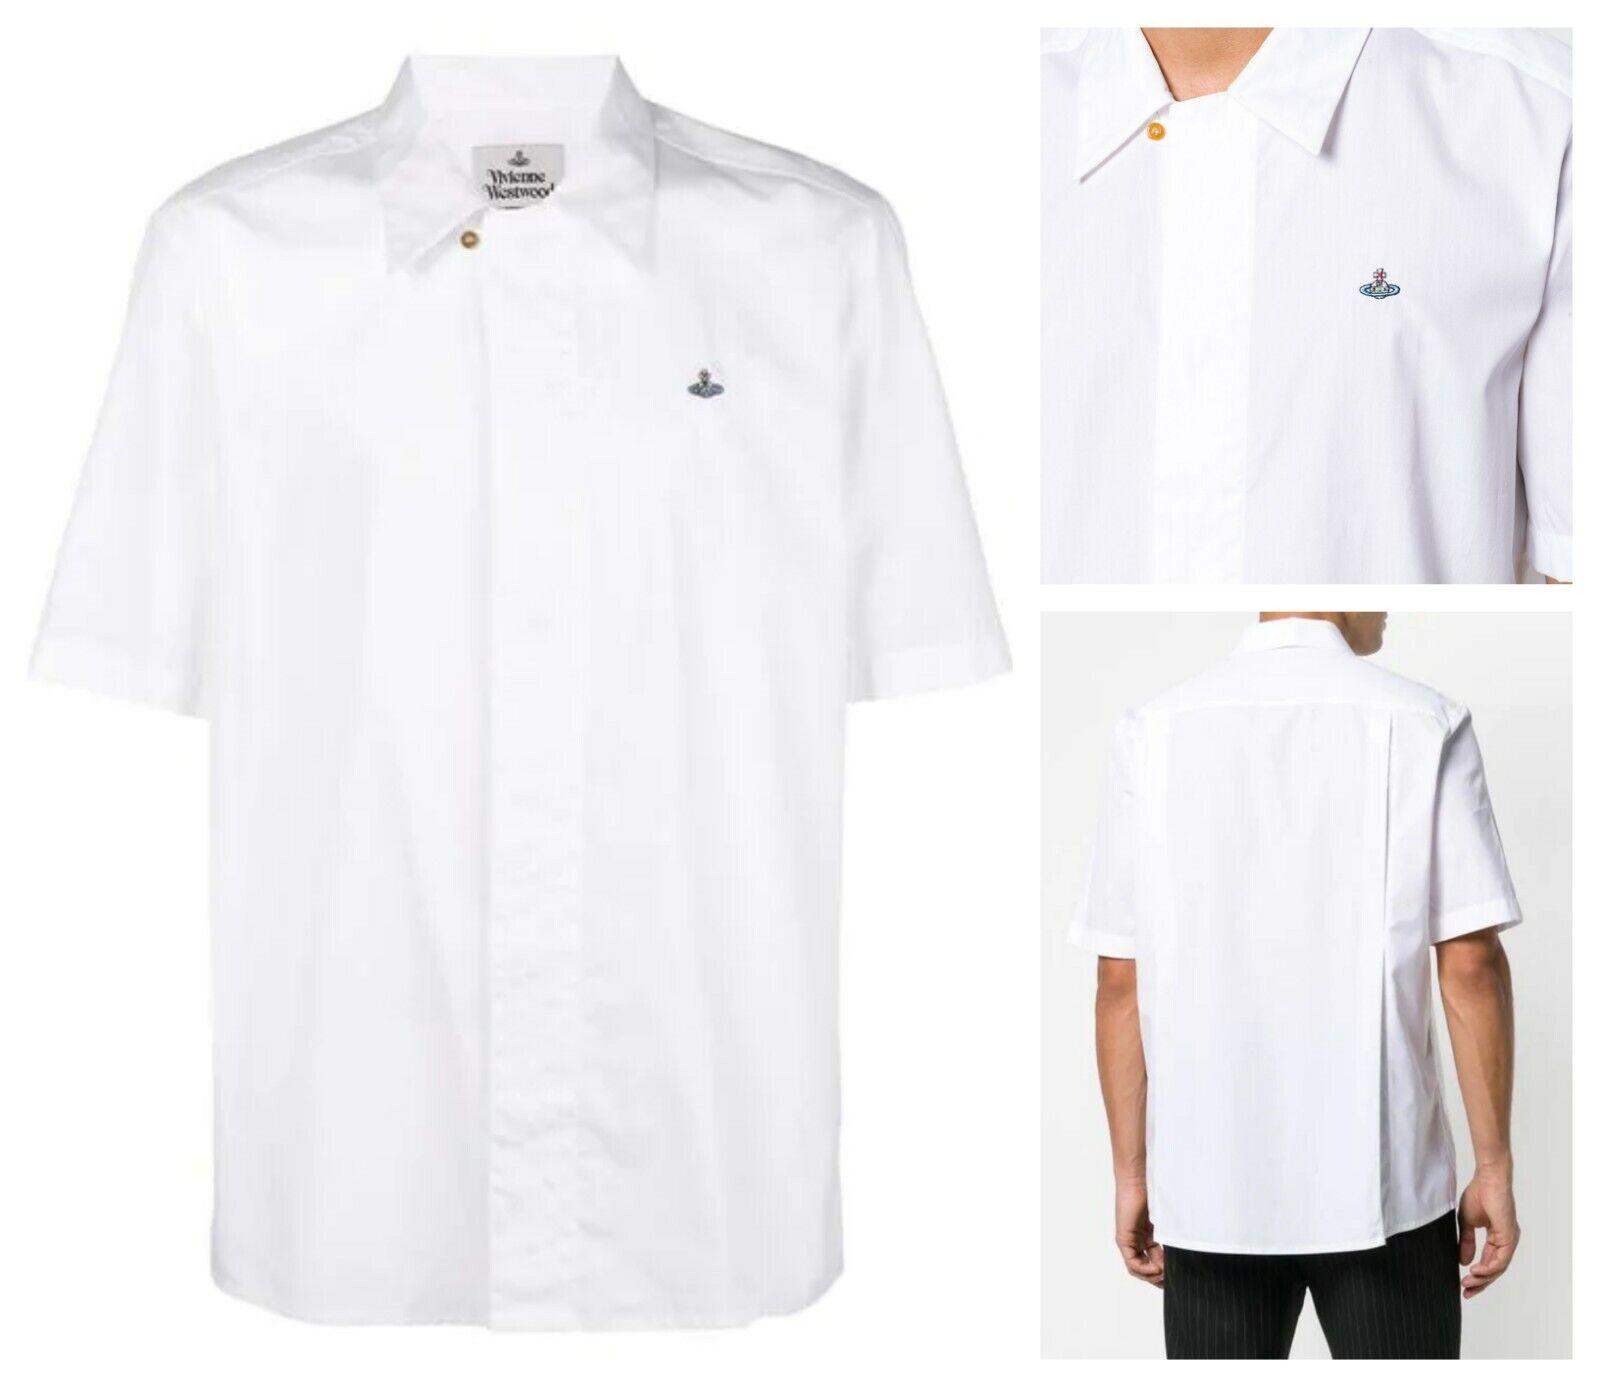 AUTHENTIC VIVIENNE WESTWOOD Weiß ORB SHORT SLEEVES hemd. IT 46 (klein)